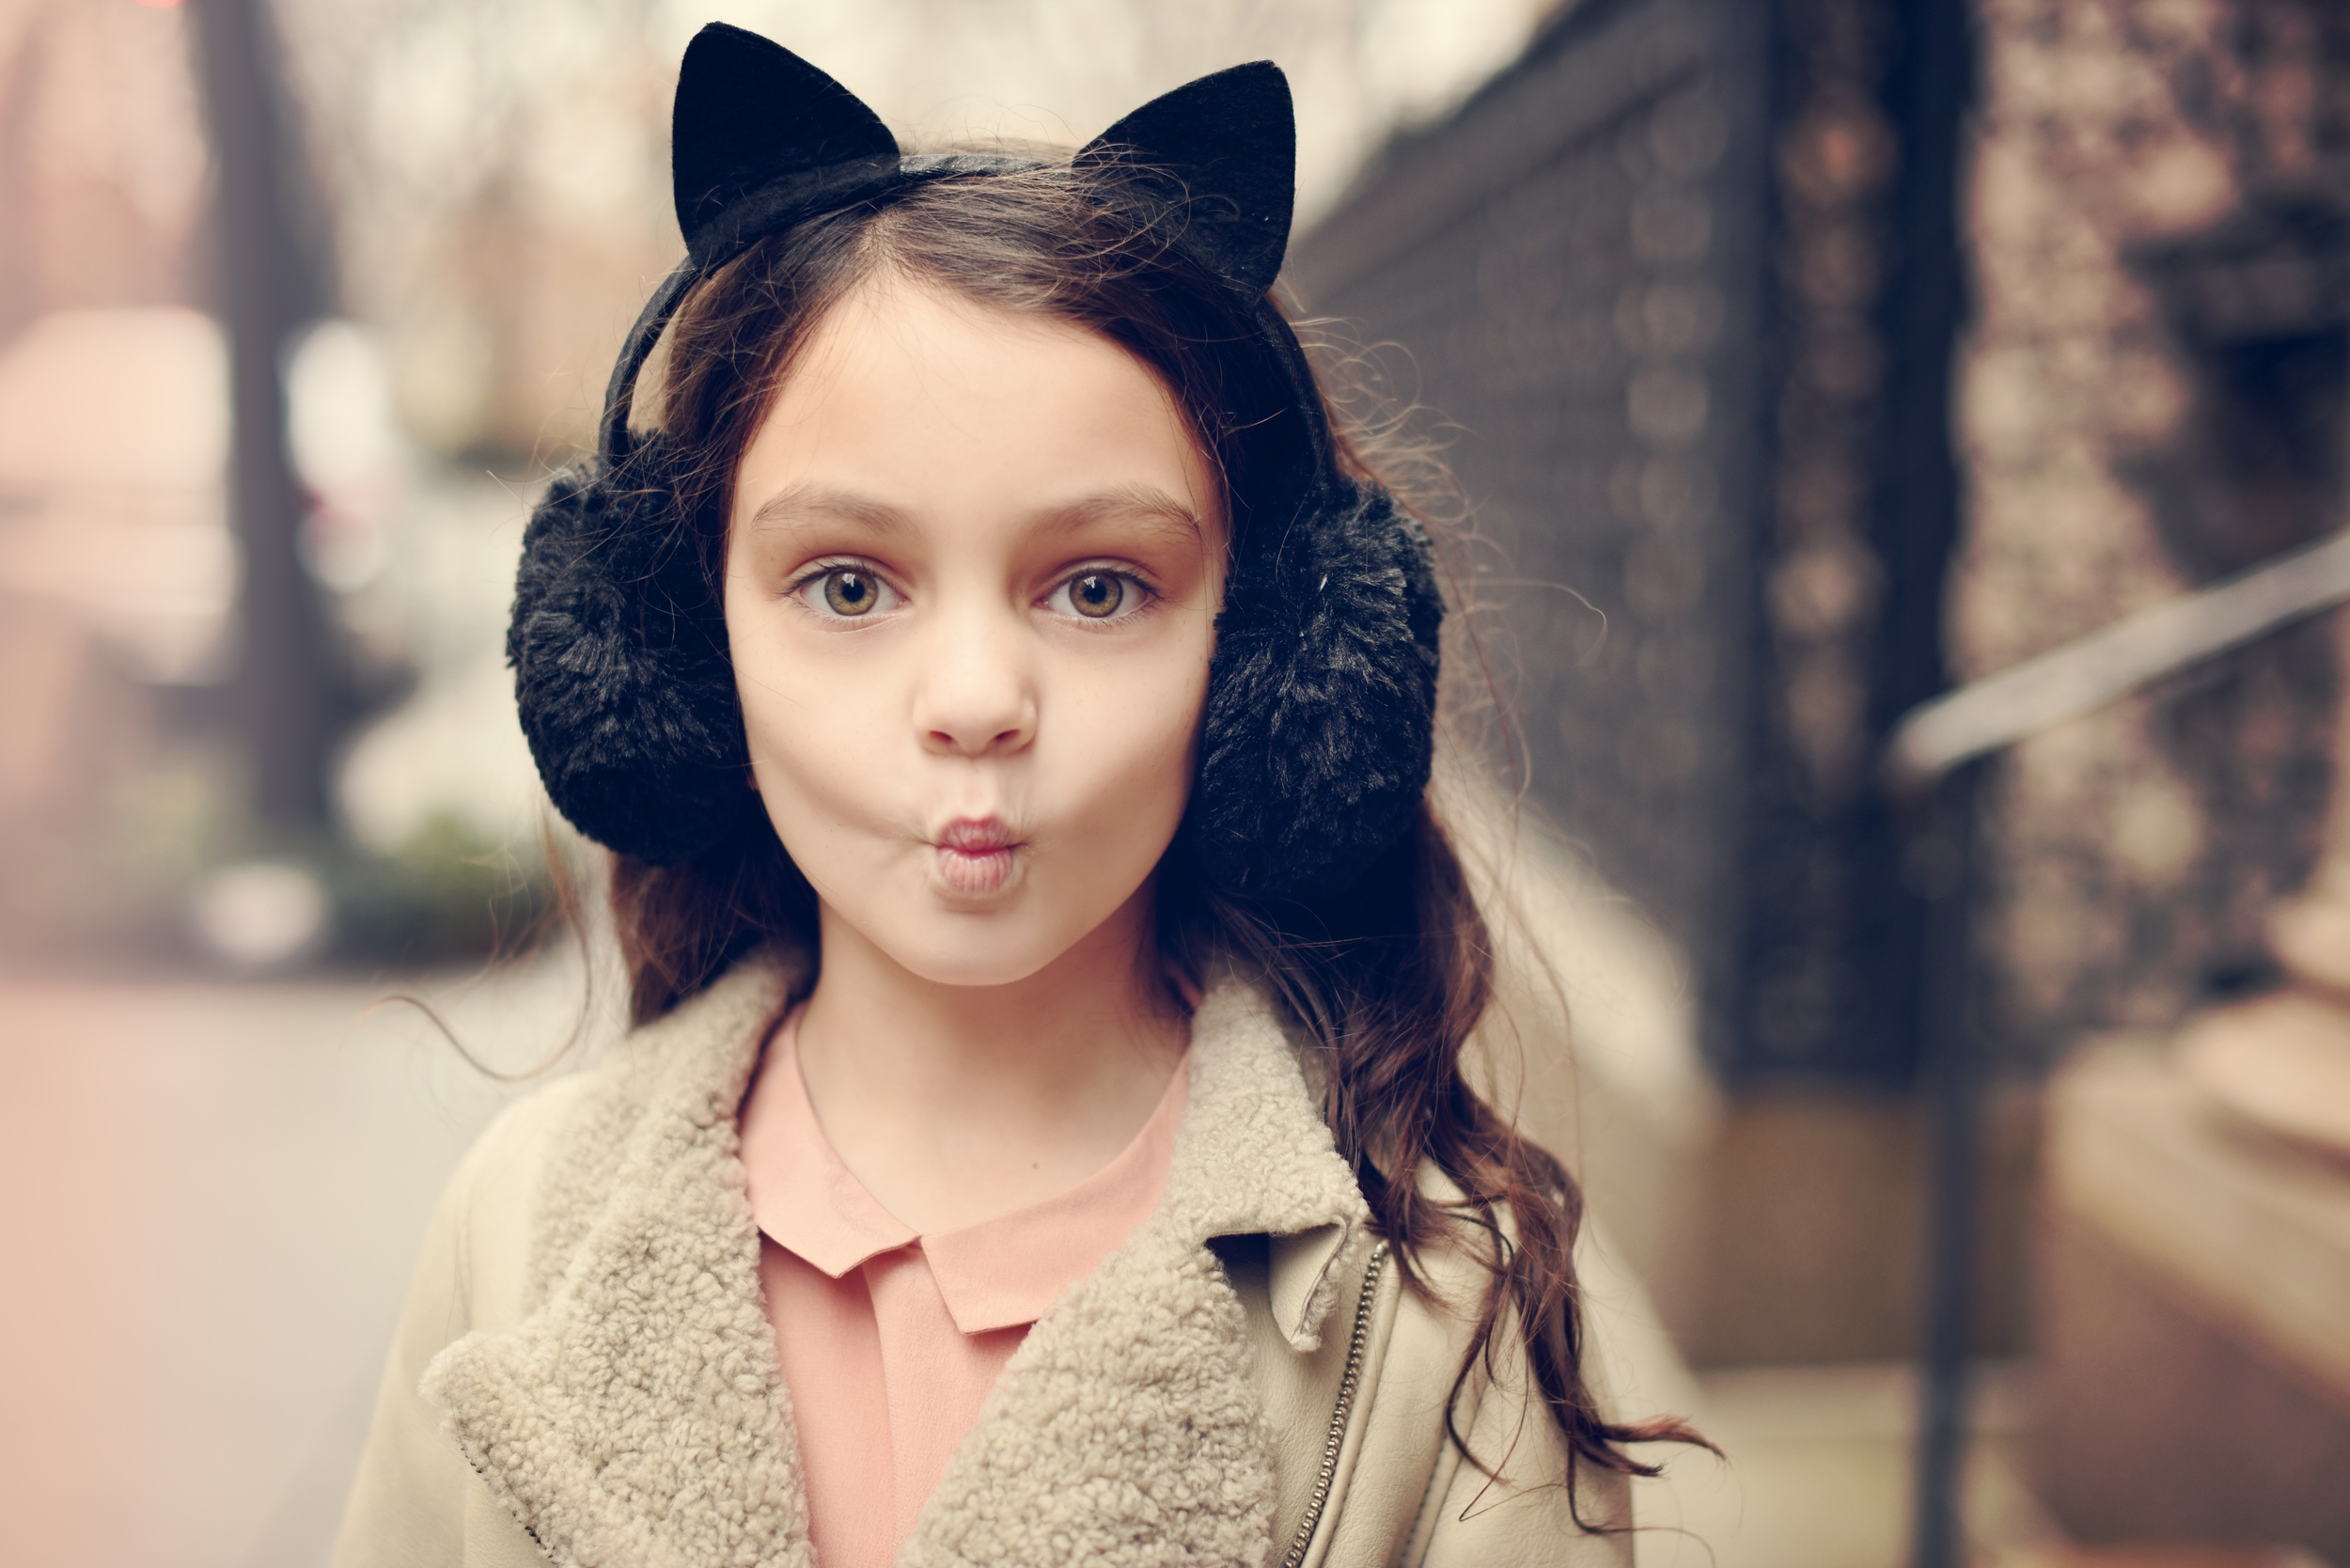 Enfant Street Style by Gina Kim Photography Marie Chantal